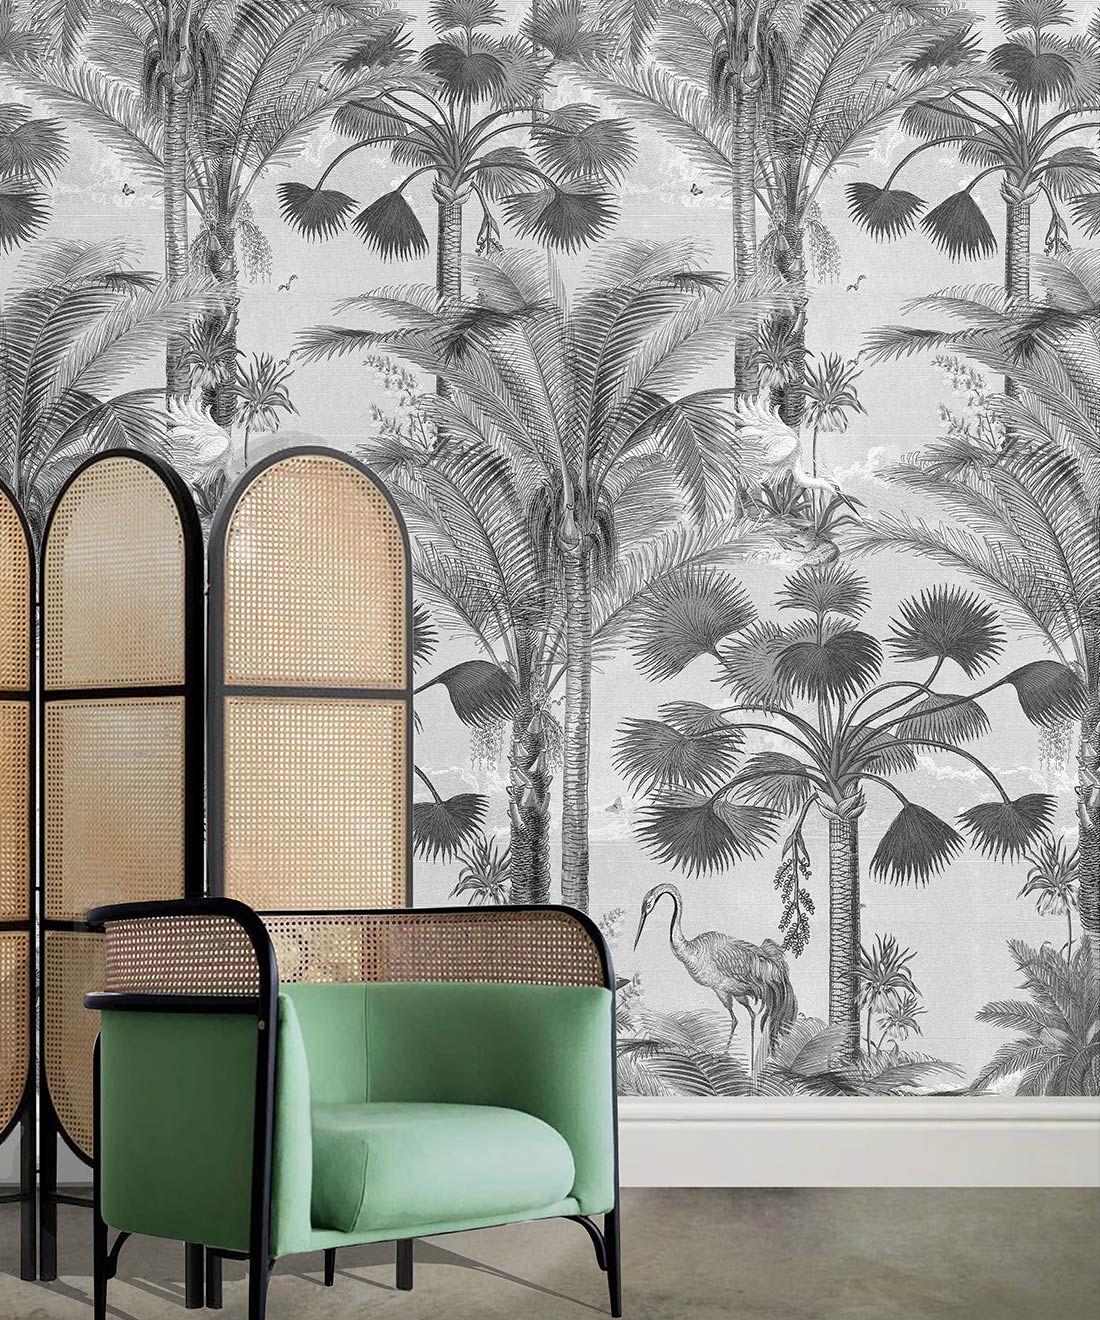 Kerala Palms Wallpaper Mural •Bethany Linz • Palm Tree Mural • Black & White • Insitu